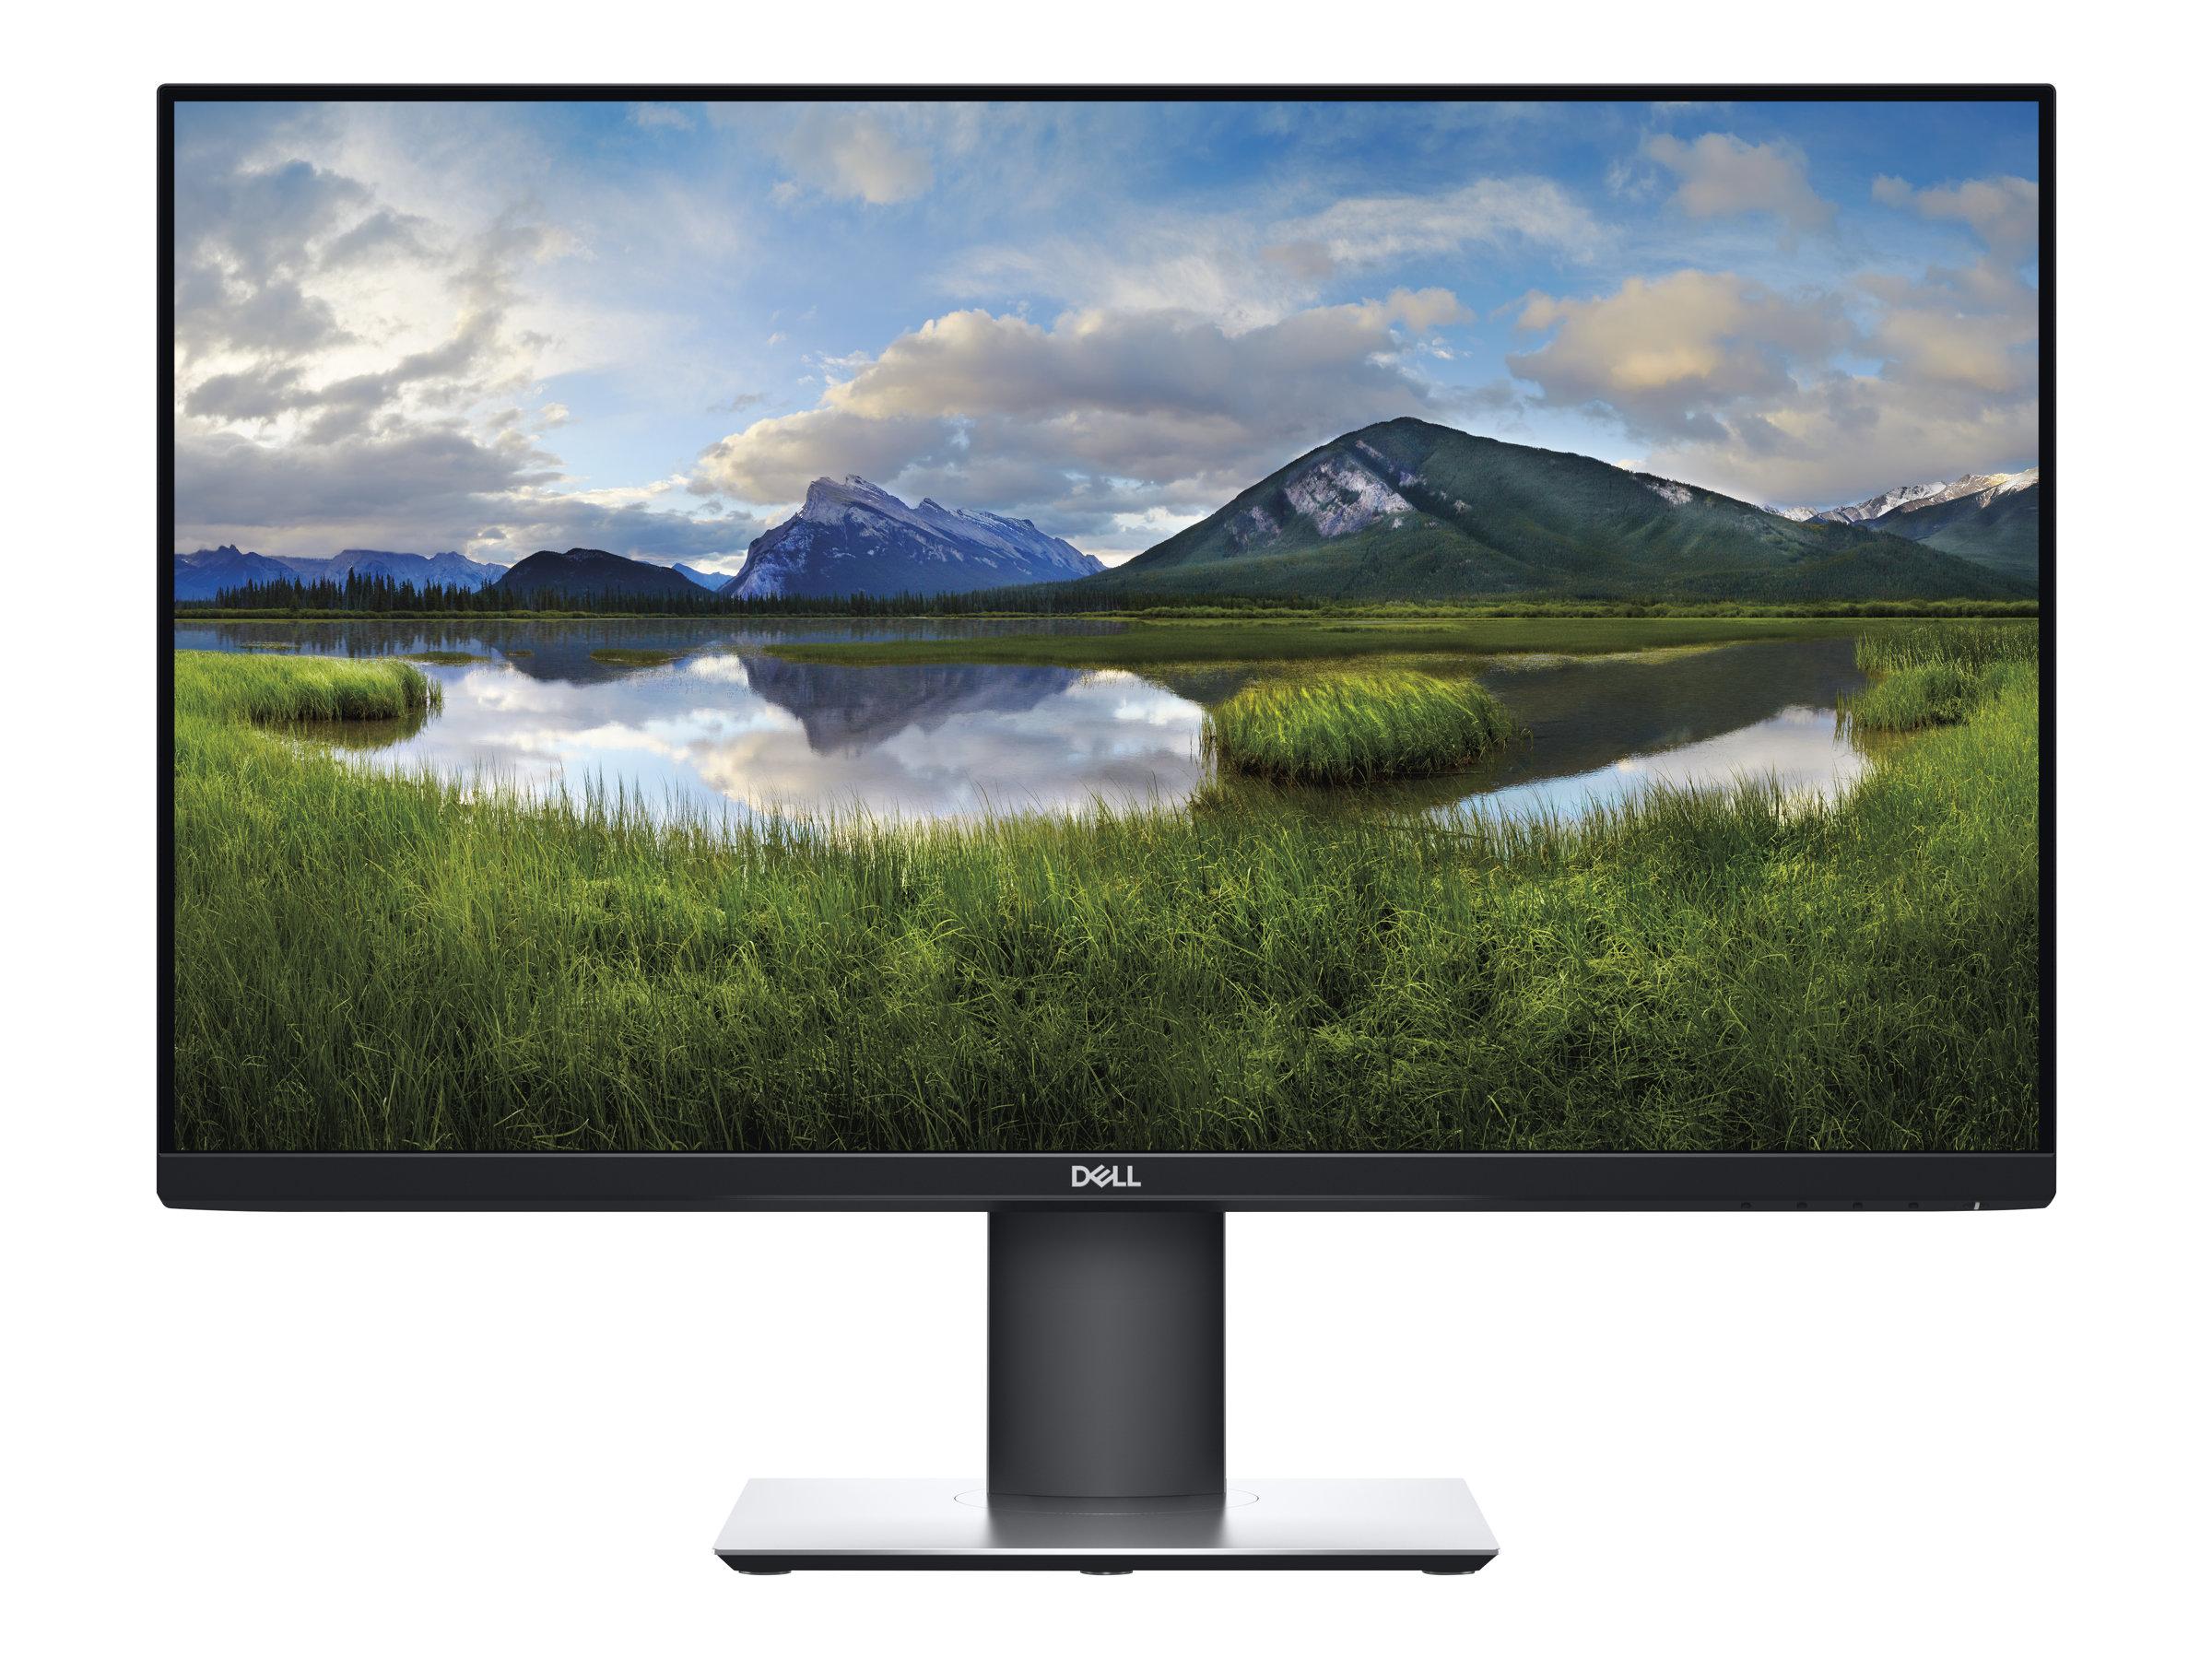 Dell P2719H - LED monitor - Full HD (1080p) - 27